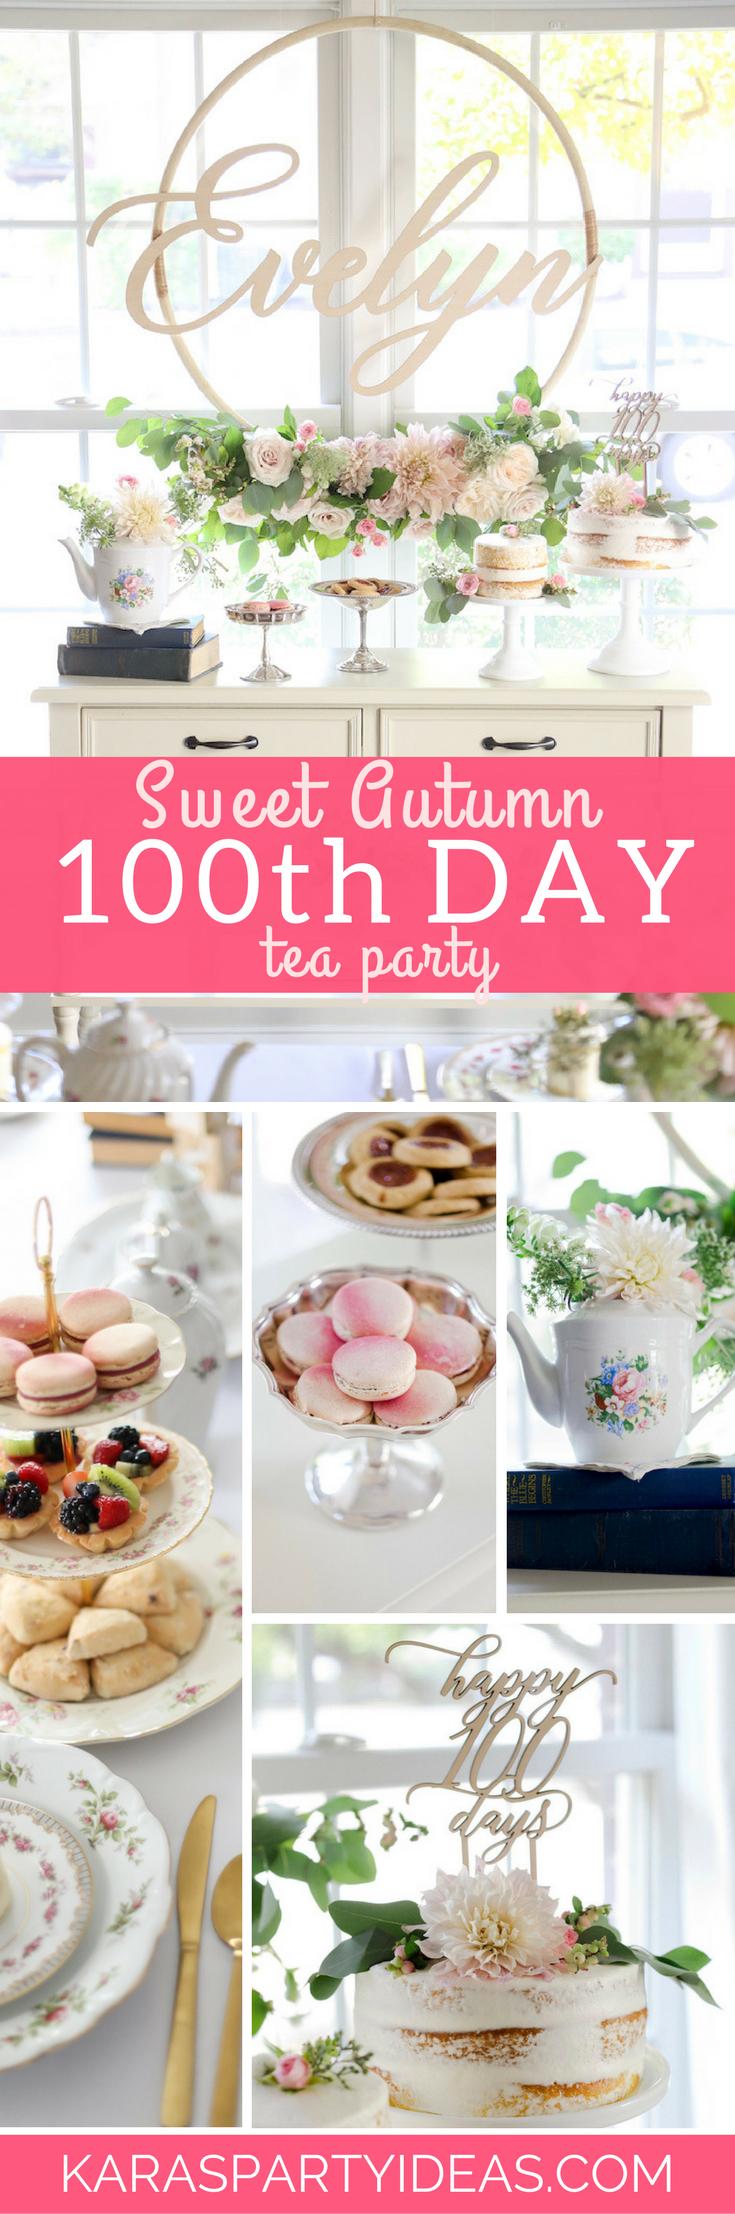 Sweet Autumn 100th Day Tea Party via Kara's Party Ideas - KarasPartyIdeas.com